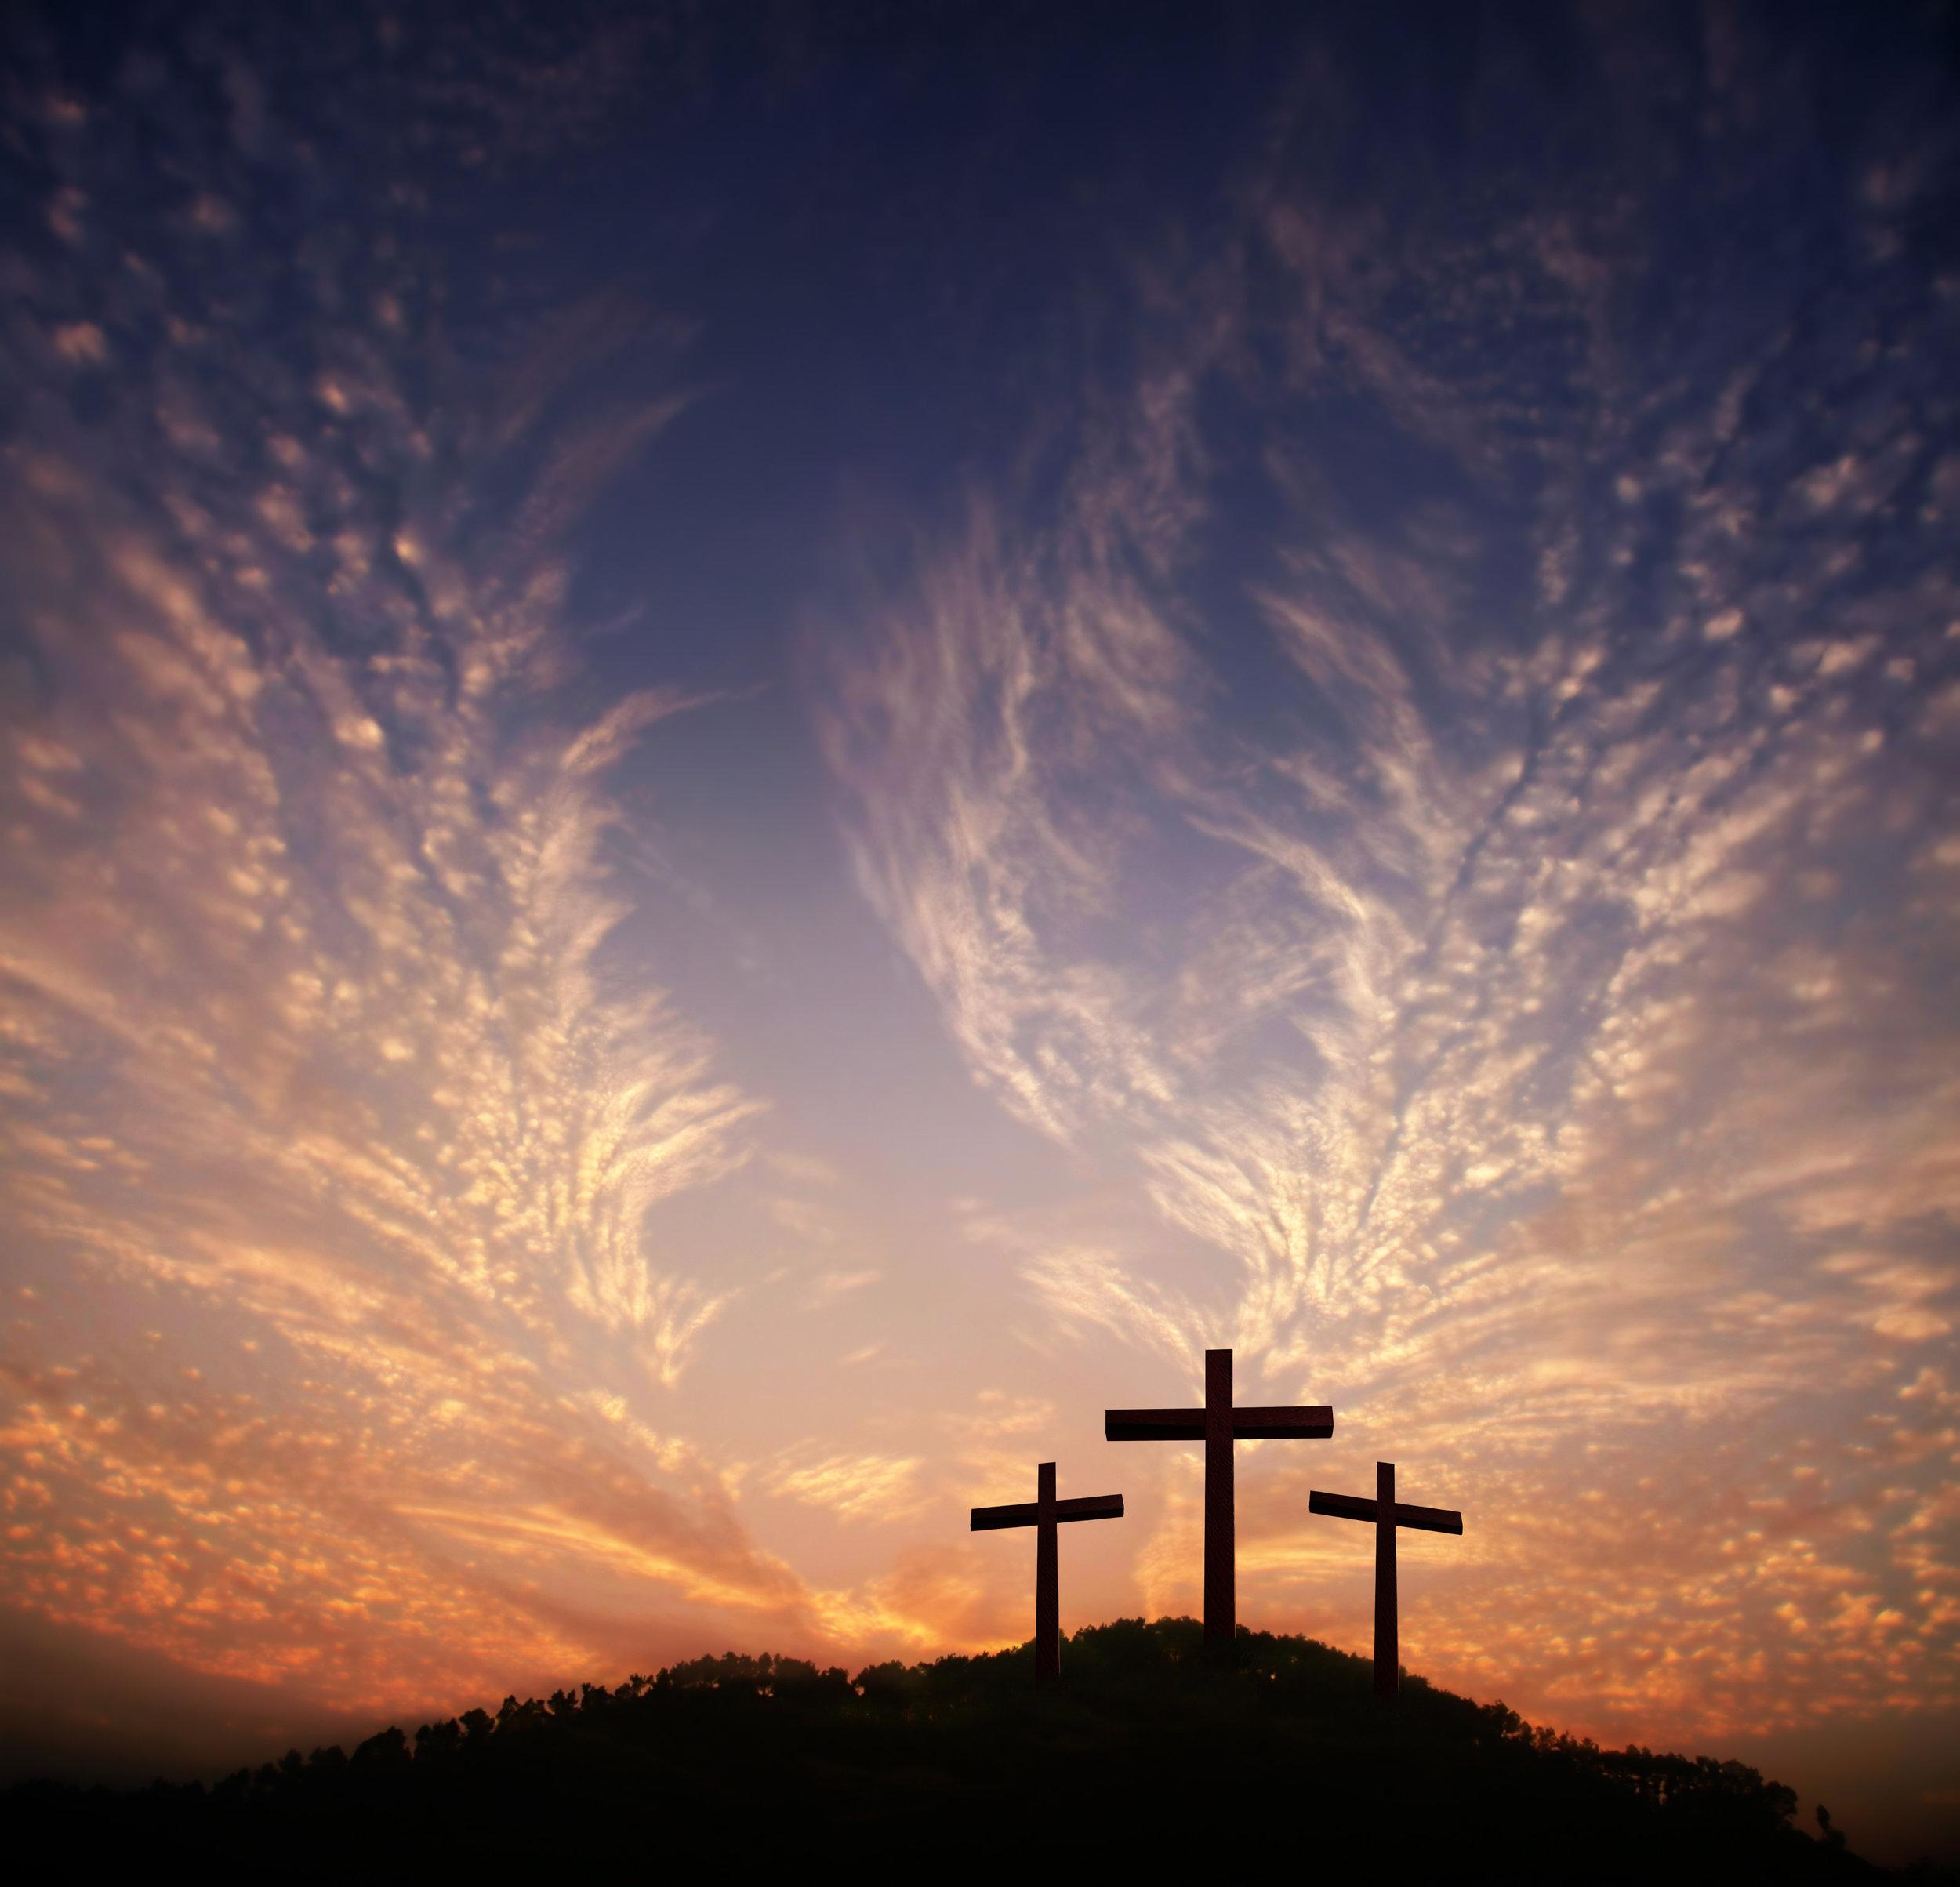 God's-love-to-people-152539305_4039x3888.jpeg